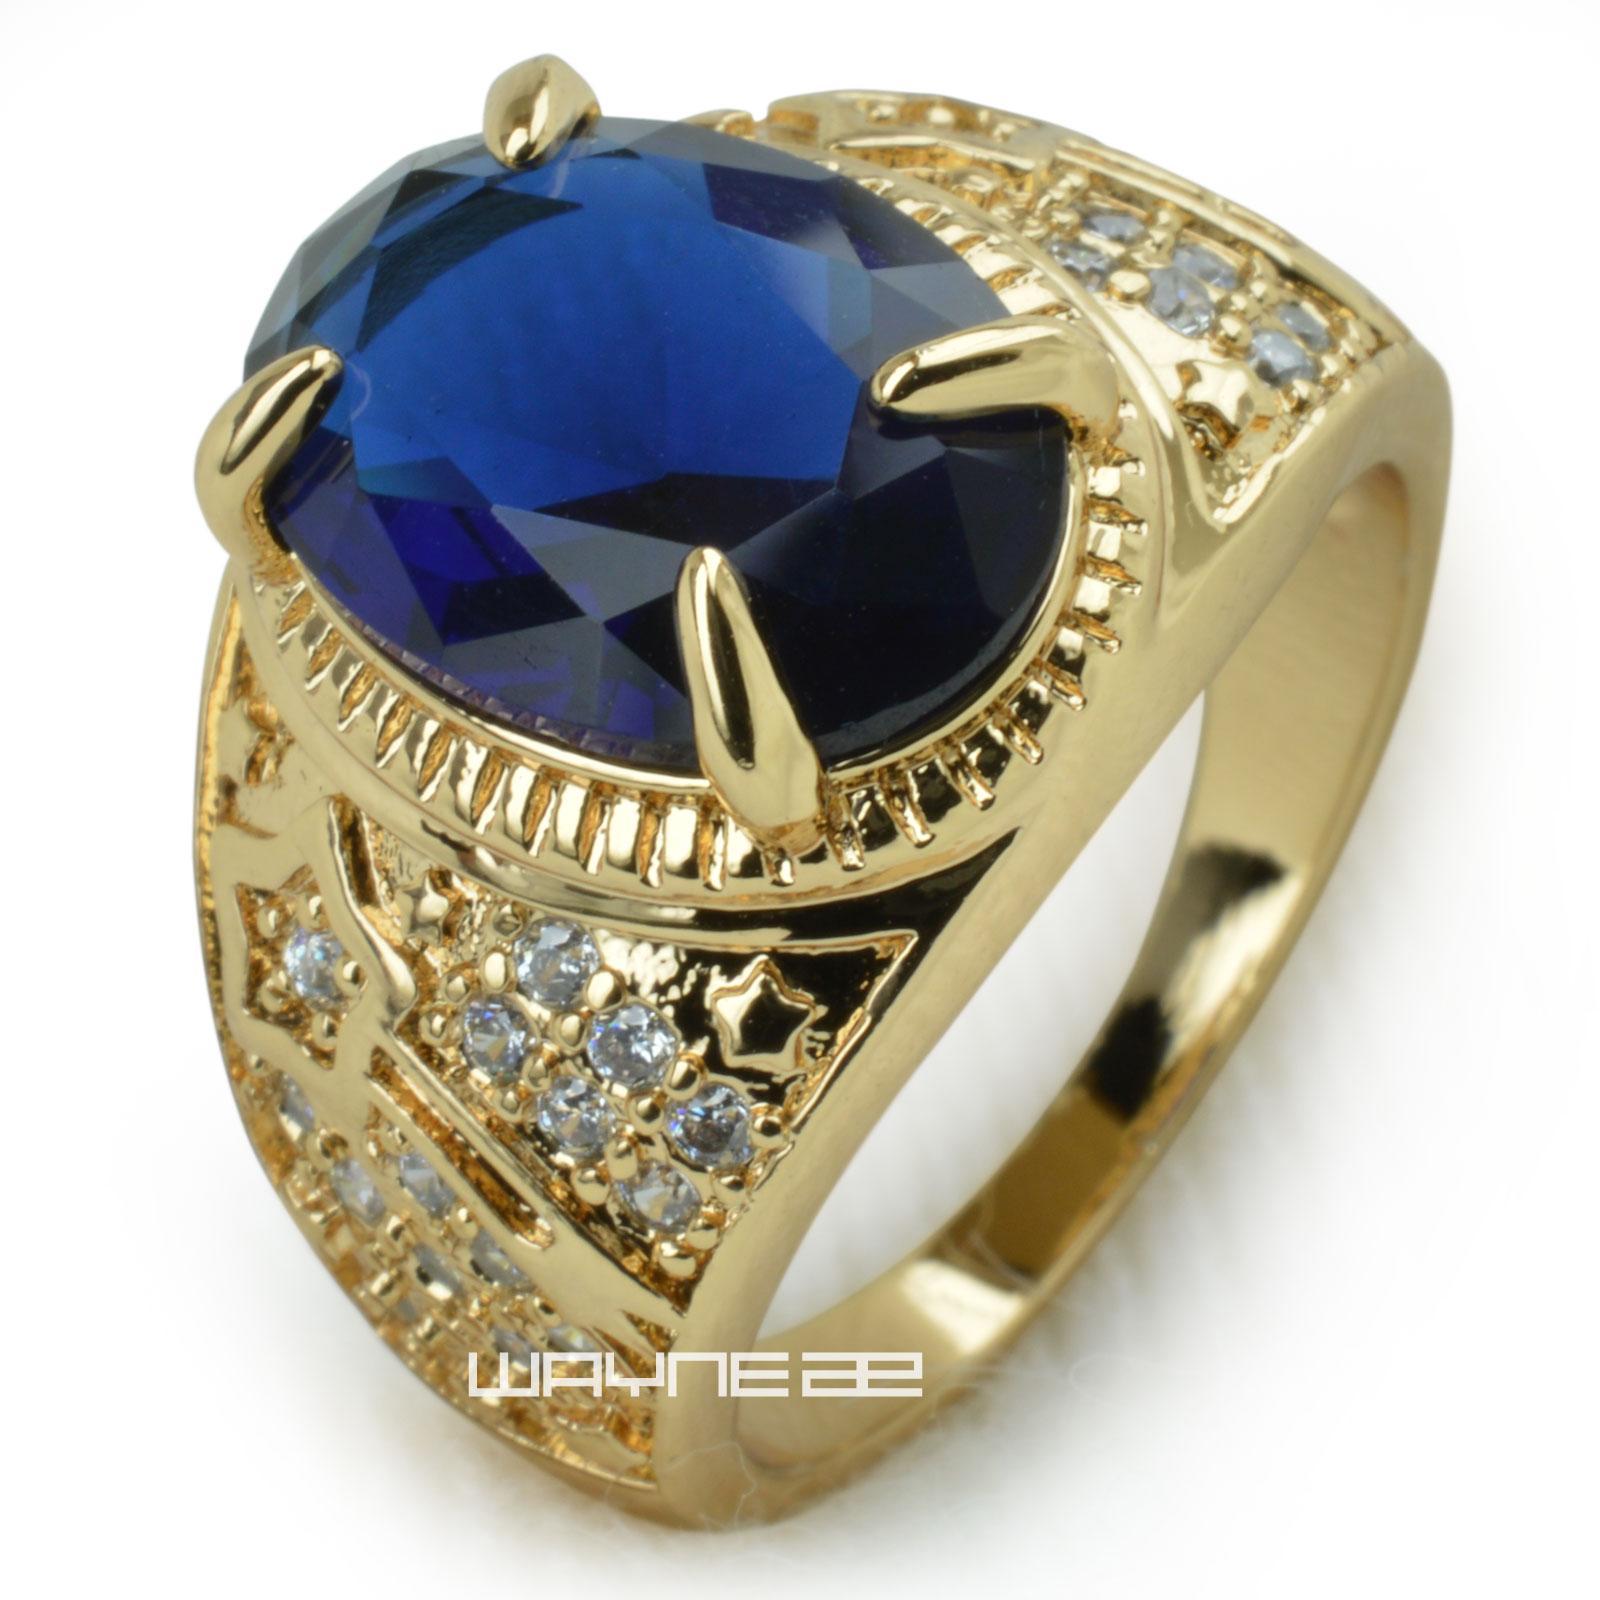 18K Gold GF Solid Men Engagement Trouwring Blauwe Steen R283 SZ 8 9 10 11 12 13 14 15